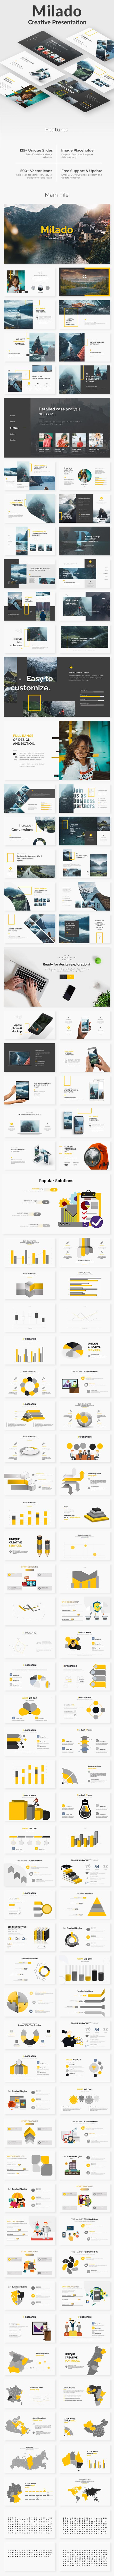 Milado Creative Design Powerpoint Template - Creative PowerPoint Templates